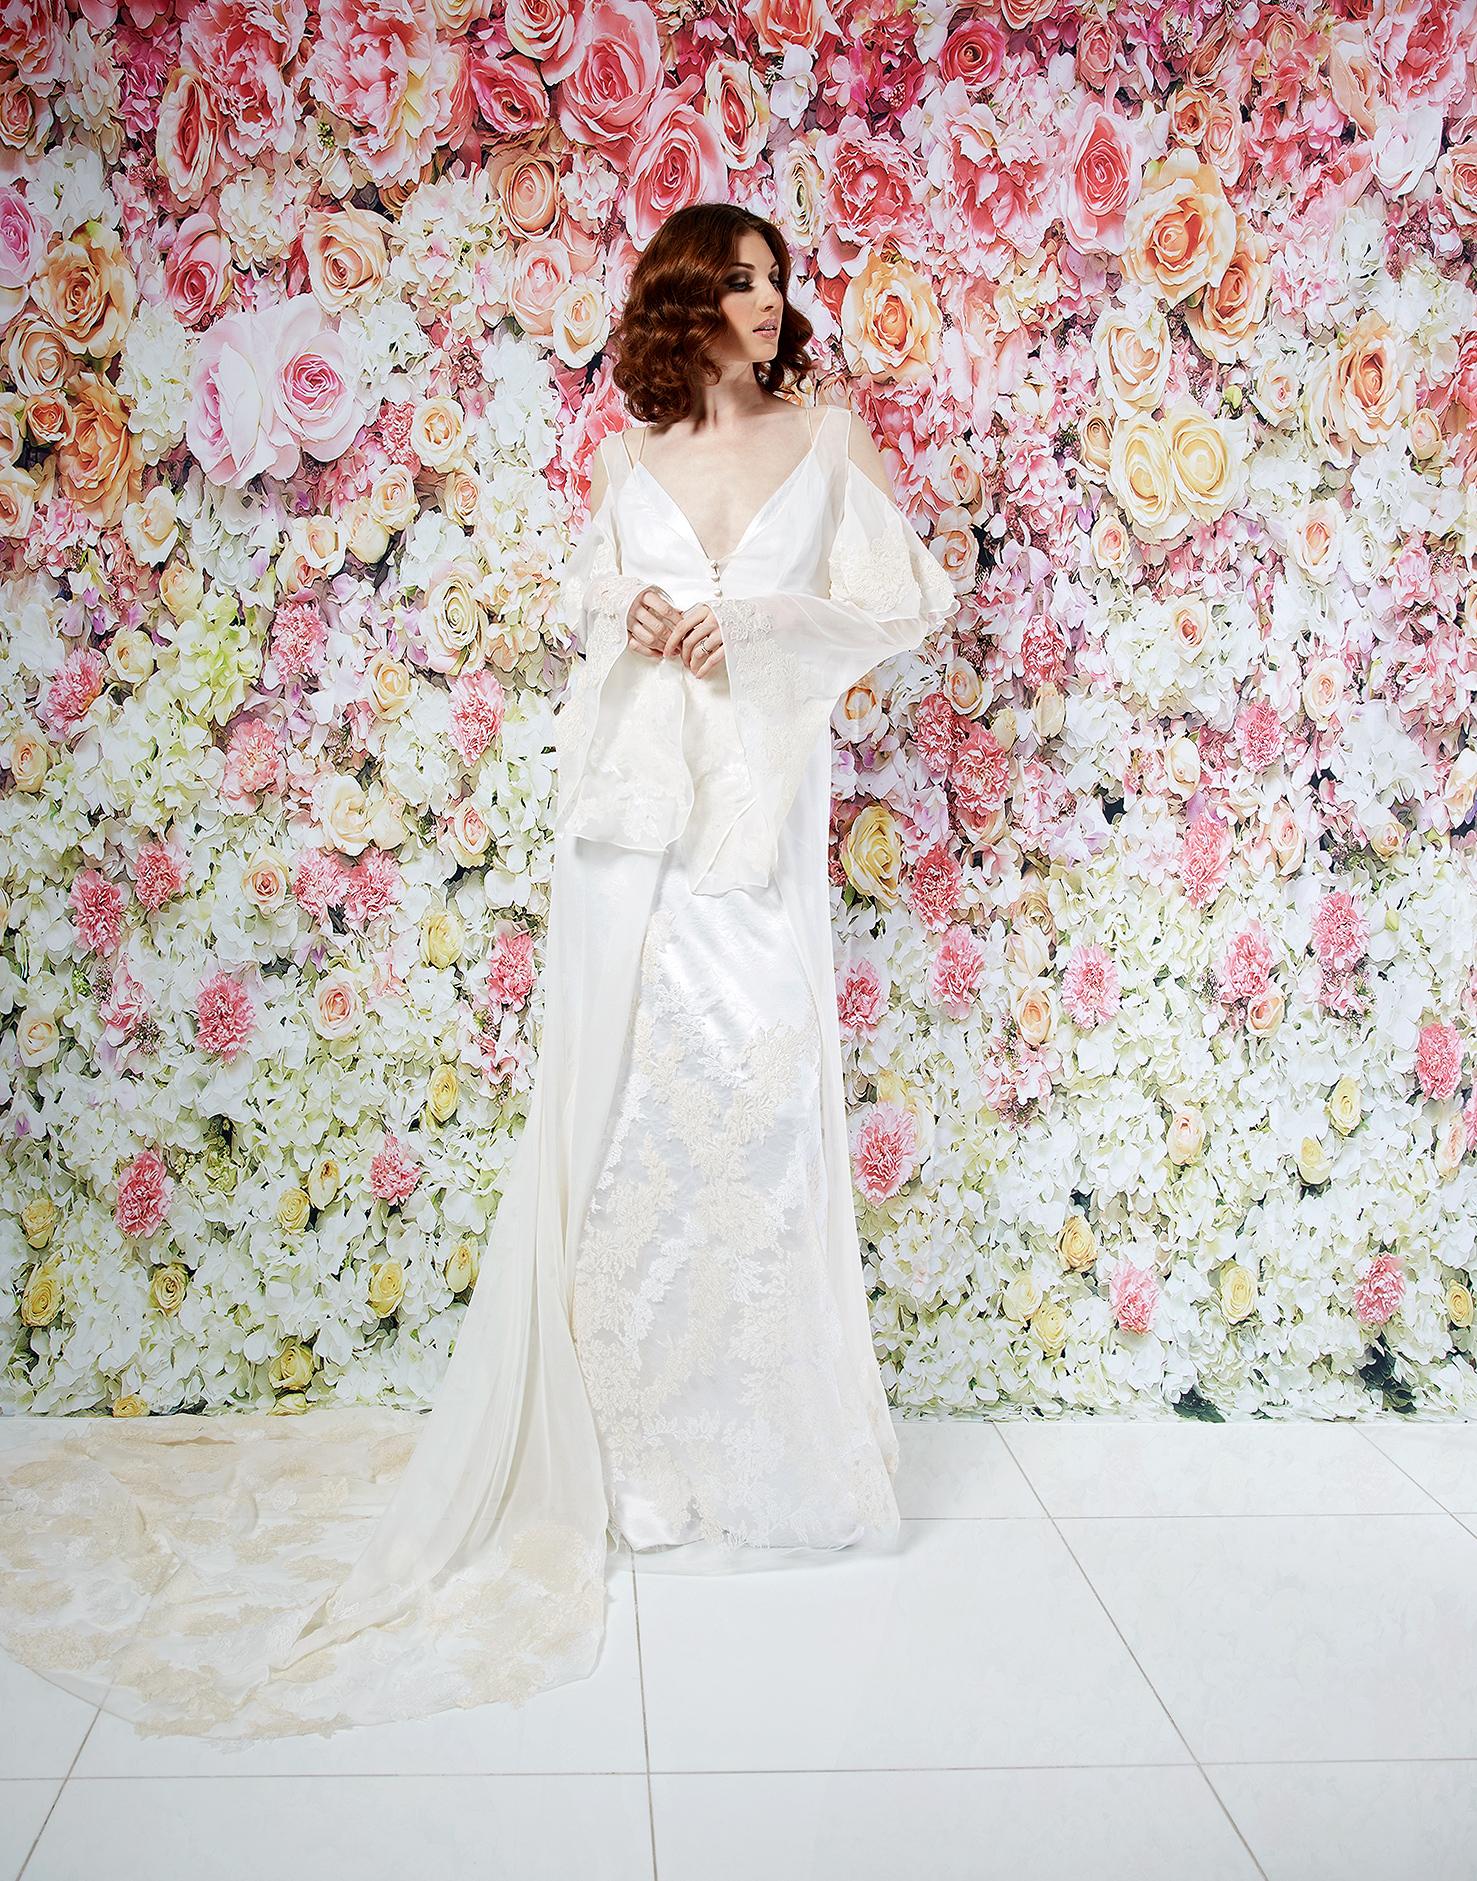 randi rahm wedding dress spring 2019 embroidered sheath sheer sleeves